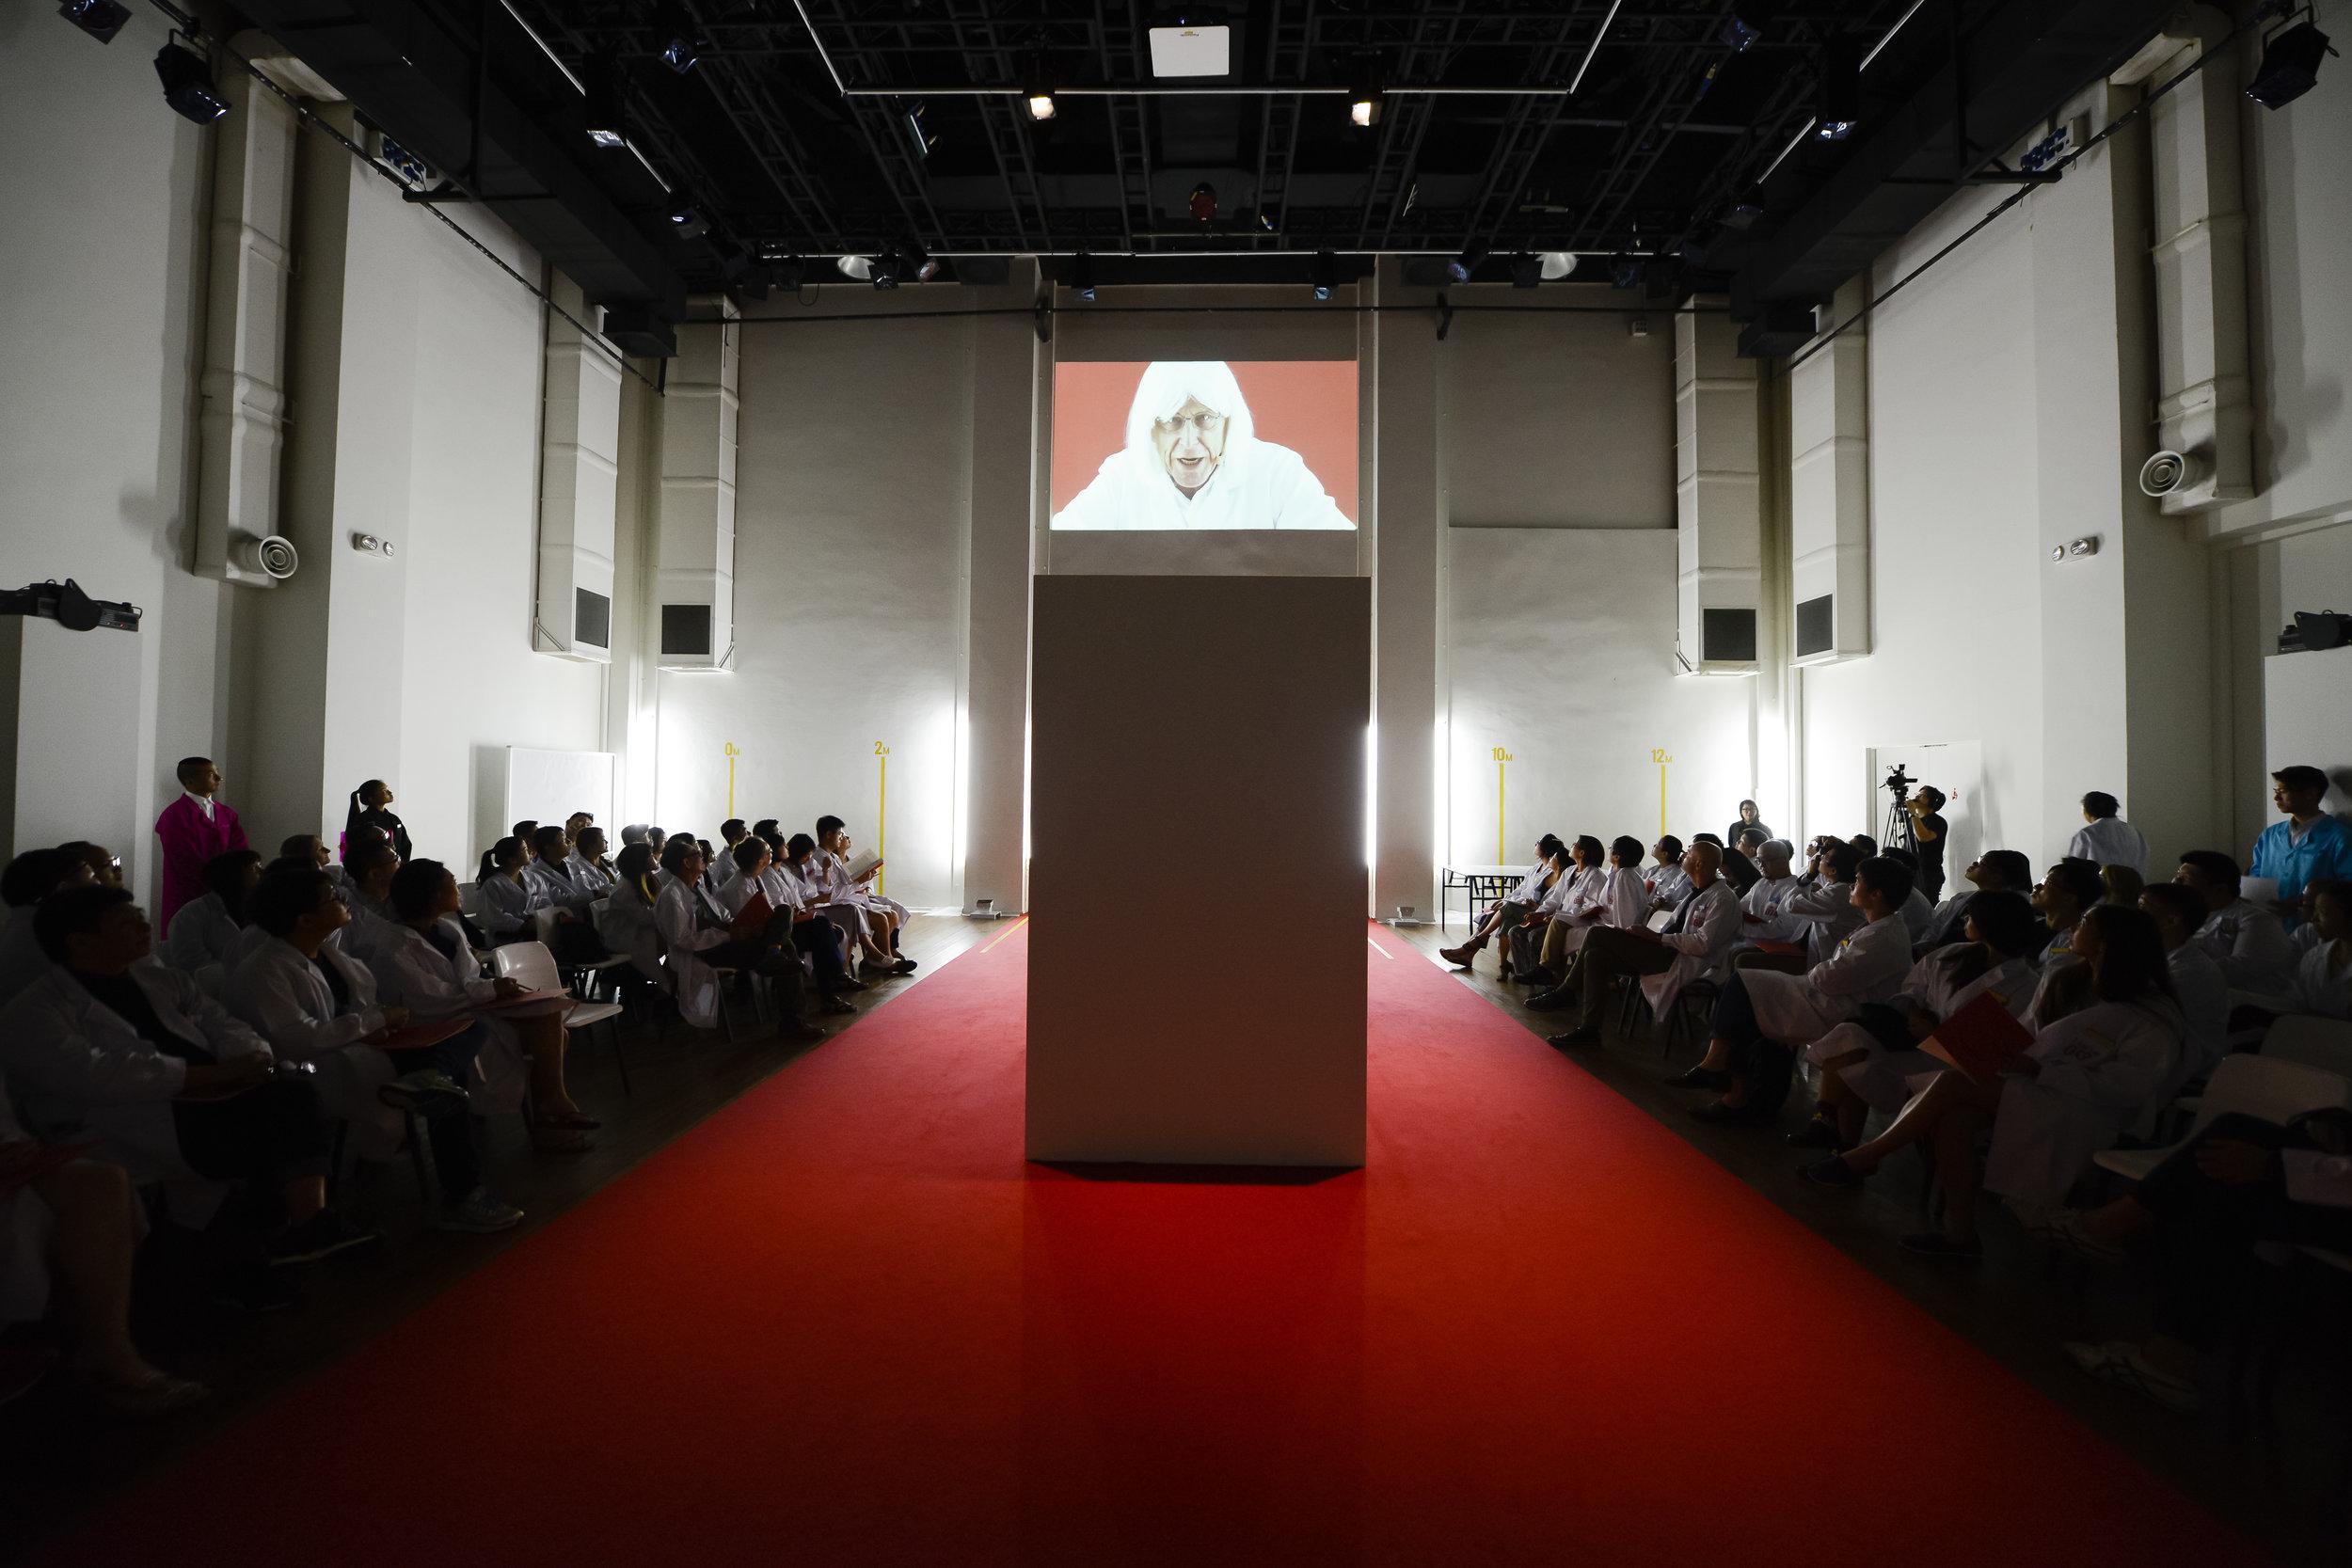 Photo   courtesy of Singapore International Festival of Arts. Photo by  Kong Chong Yew